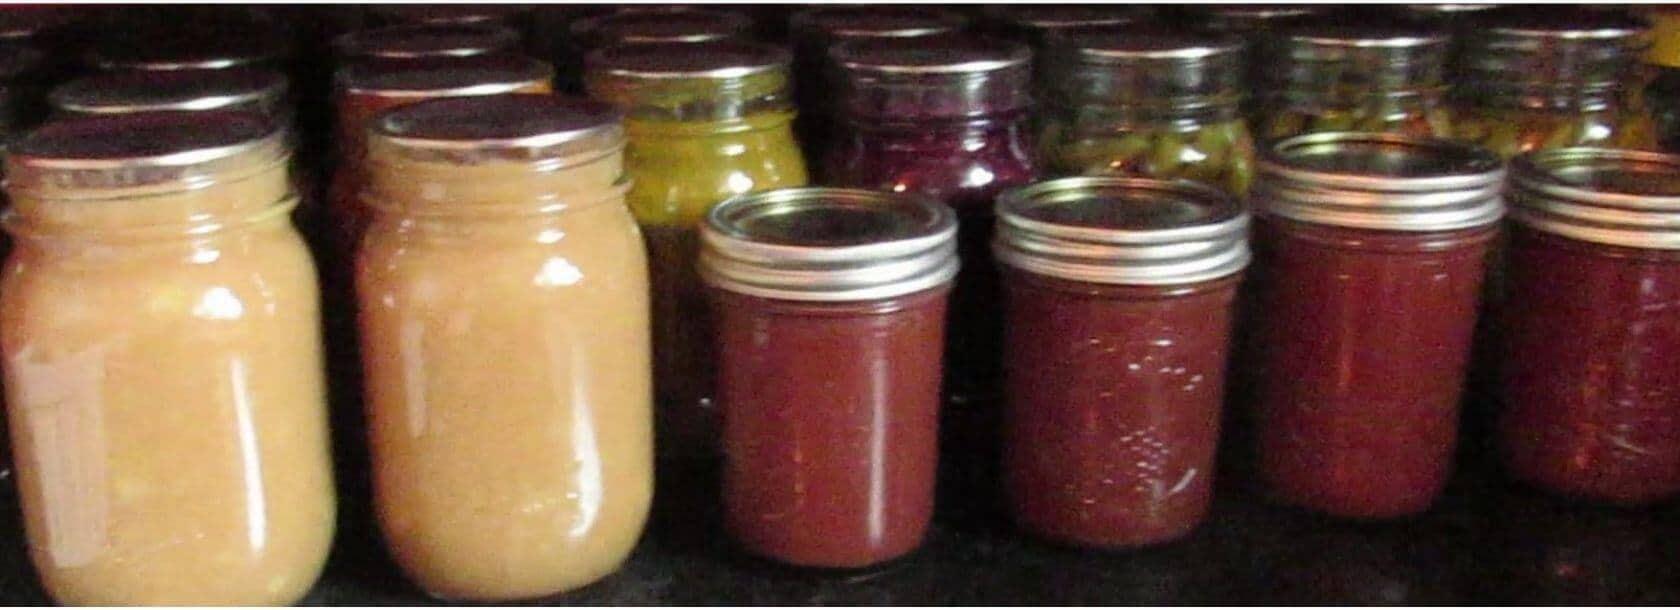 Canning jars full